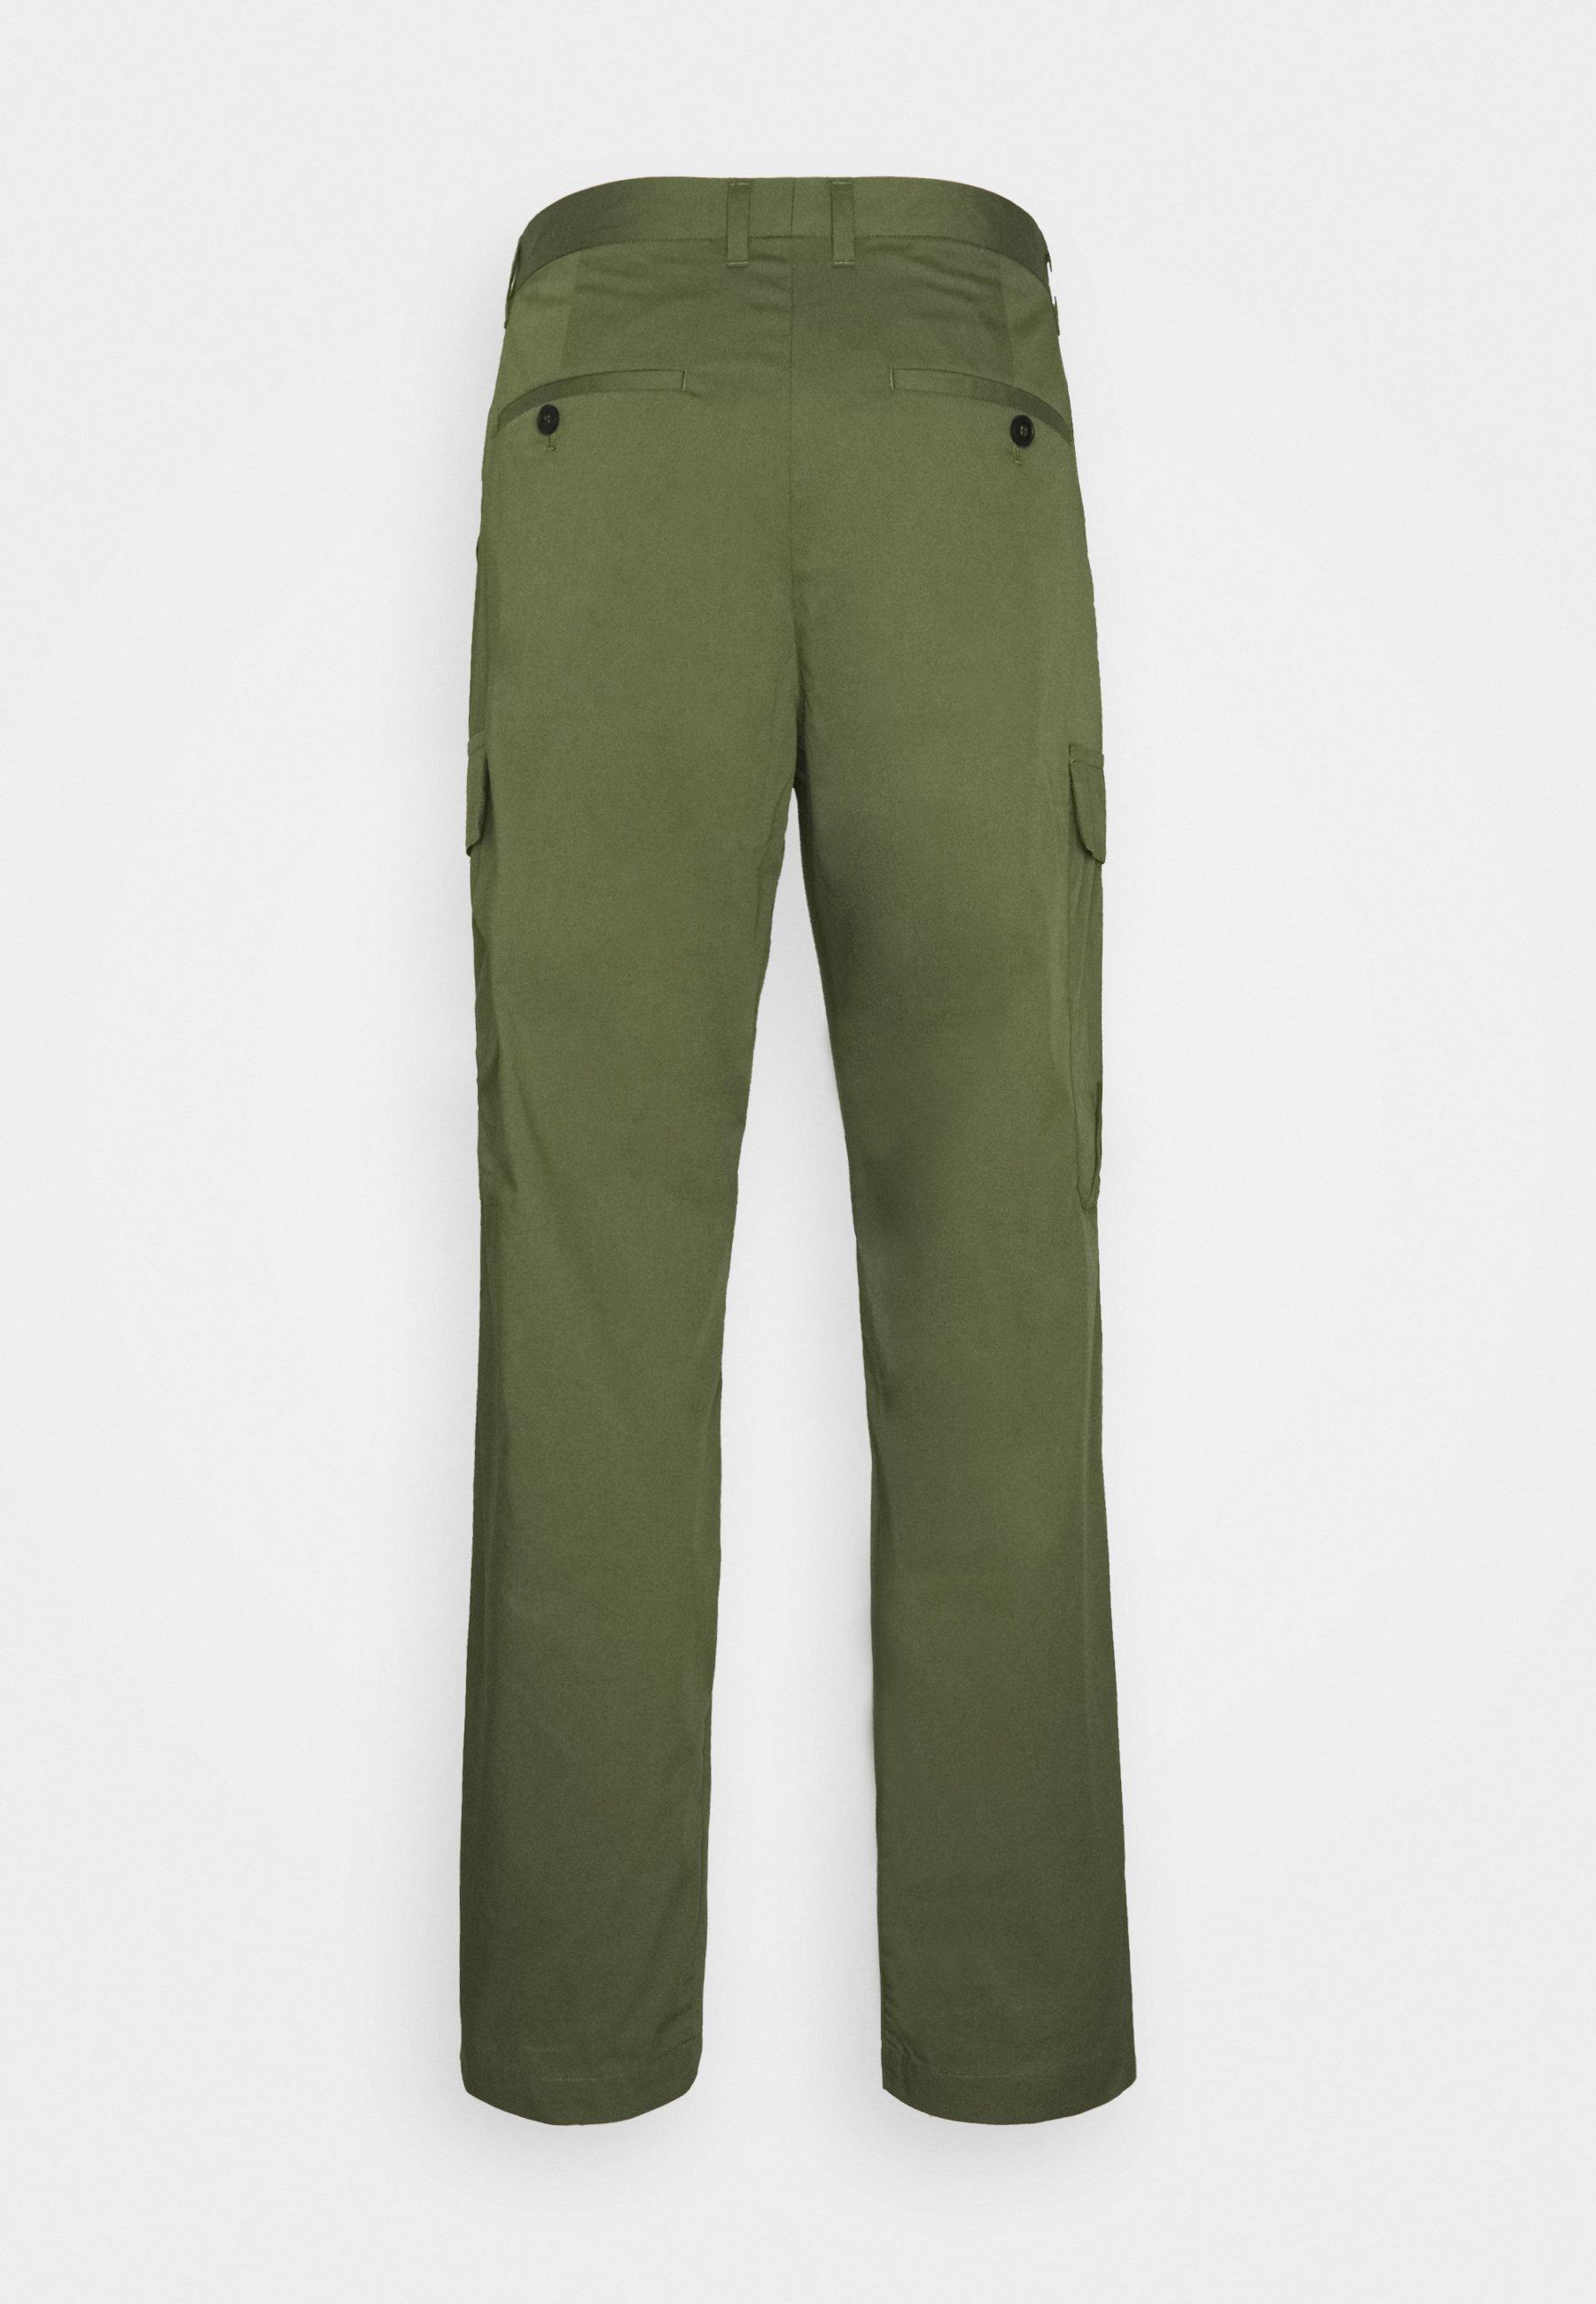 Homme SLHREG MOLKE PANTS - Pantalon cargo